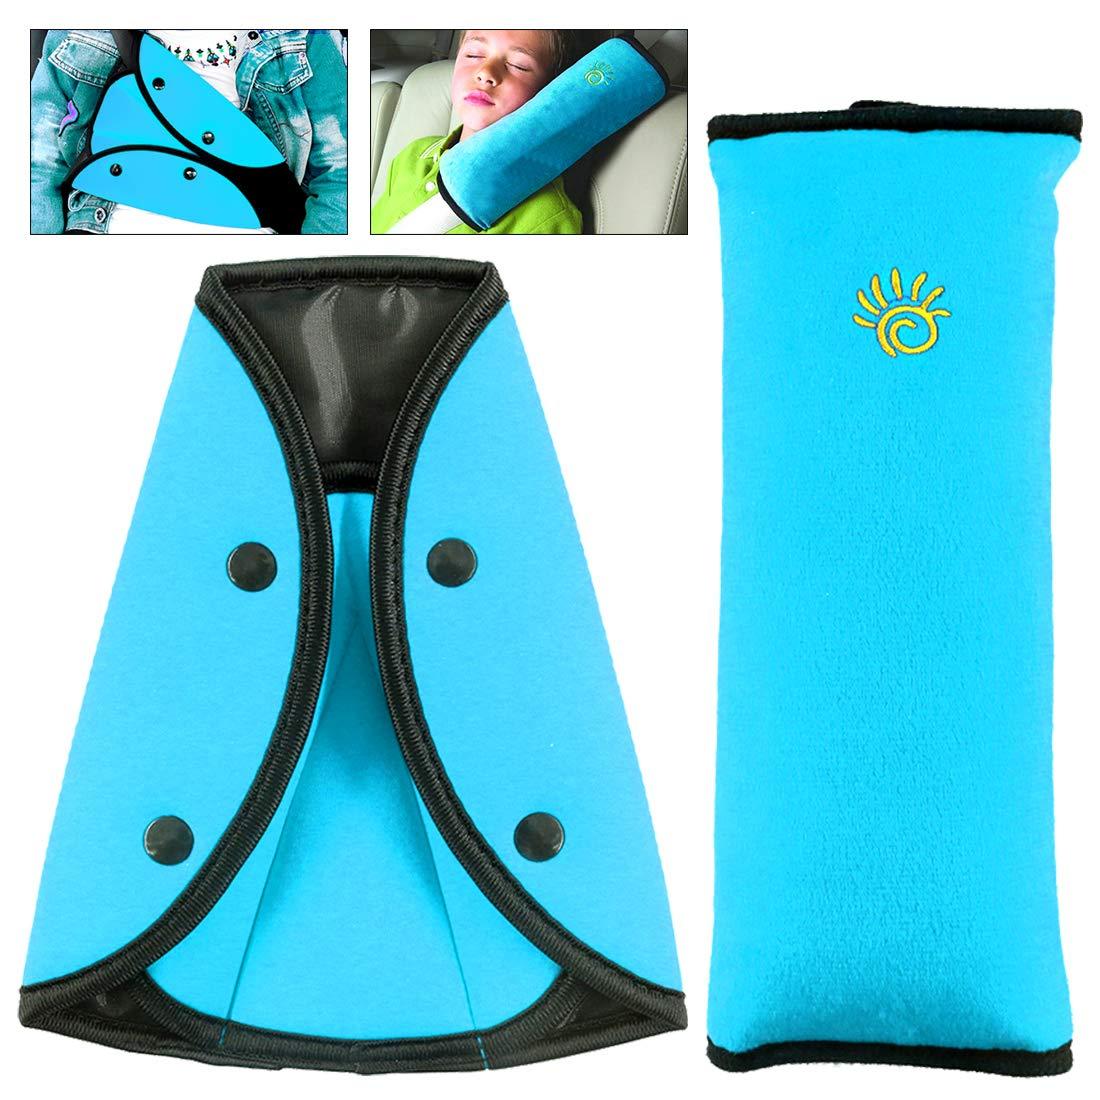 Keadic 2 - piece Seat Belt Pillow and Kids Seatbelt Adjuster Set, Soft Neck Support Headrest Seatbelt Pillow Cover and Seat Belt Adjuster for kids Toddlers Boys Girls Adults (Blue) by Keadic